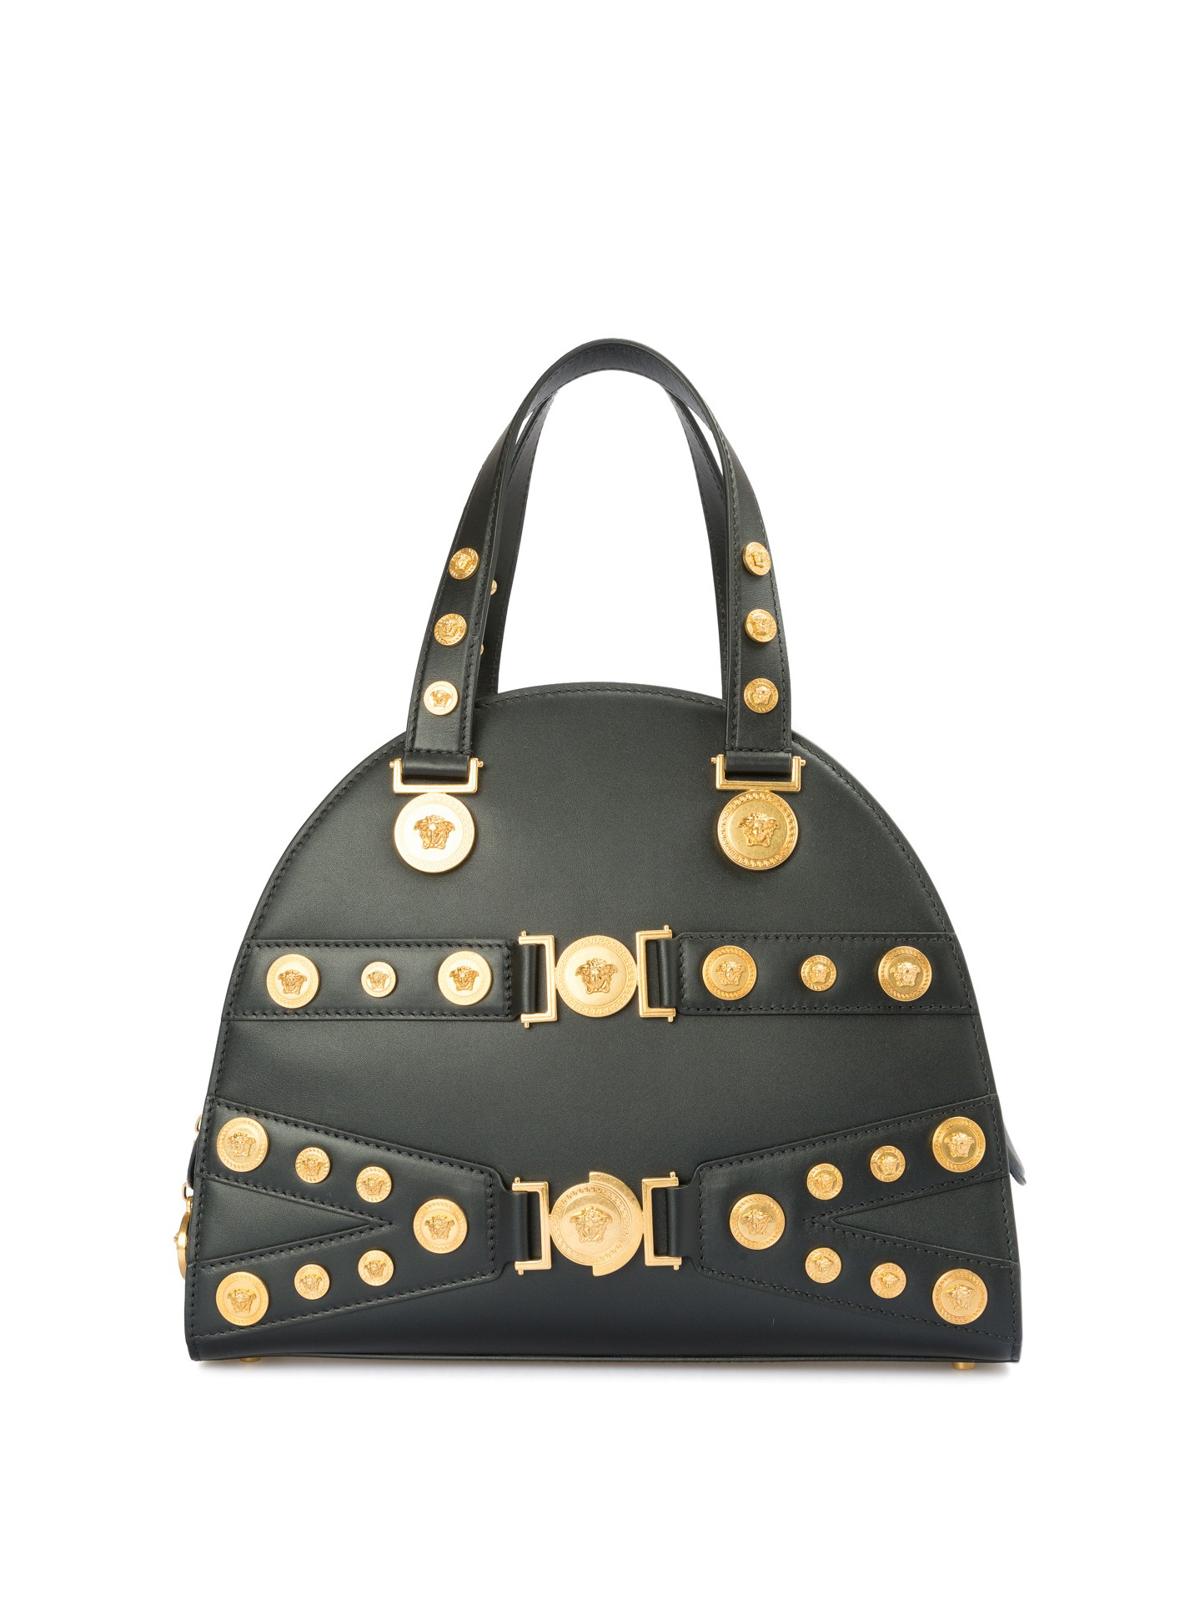 1d56040d809 Versace - Tribute leather handbag - totes bags - DBFG307DV1TK41OT